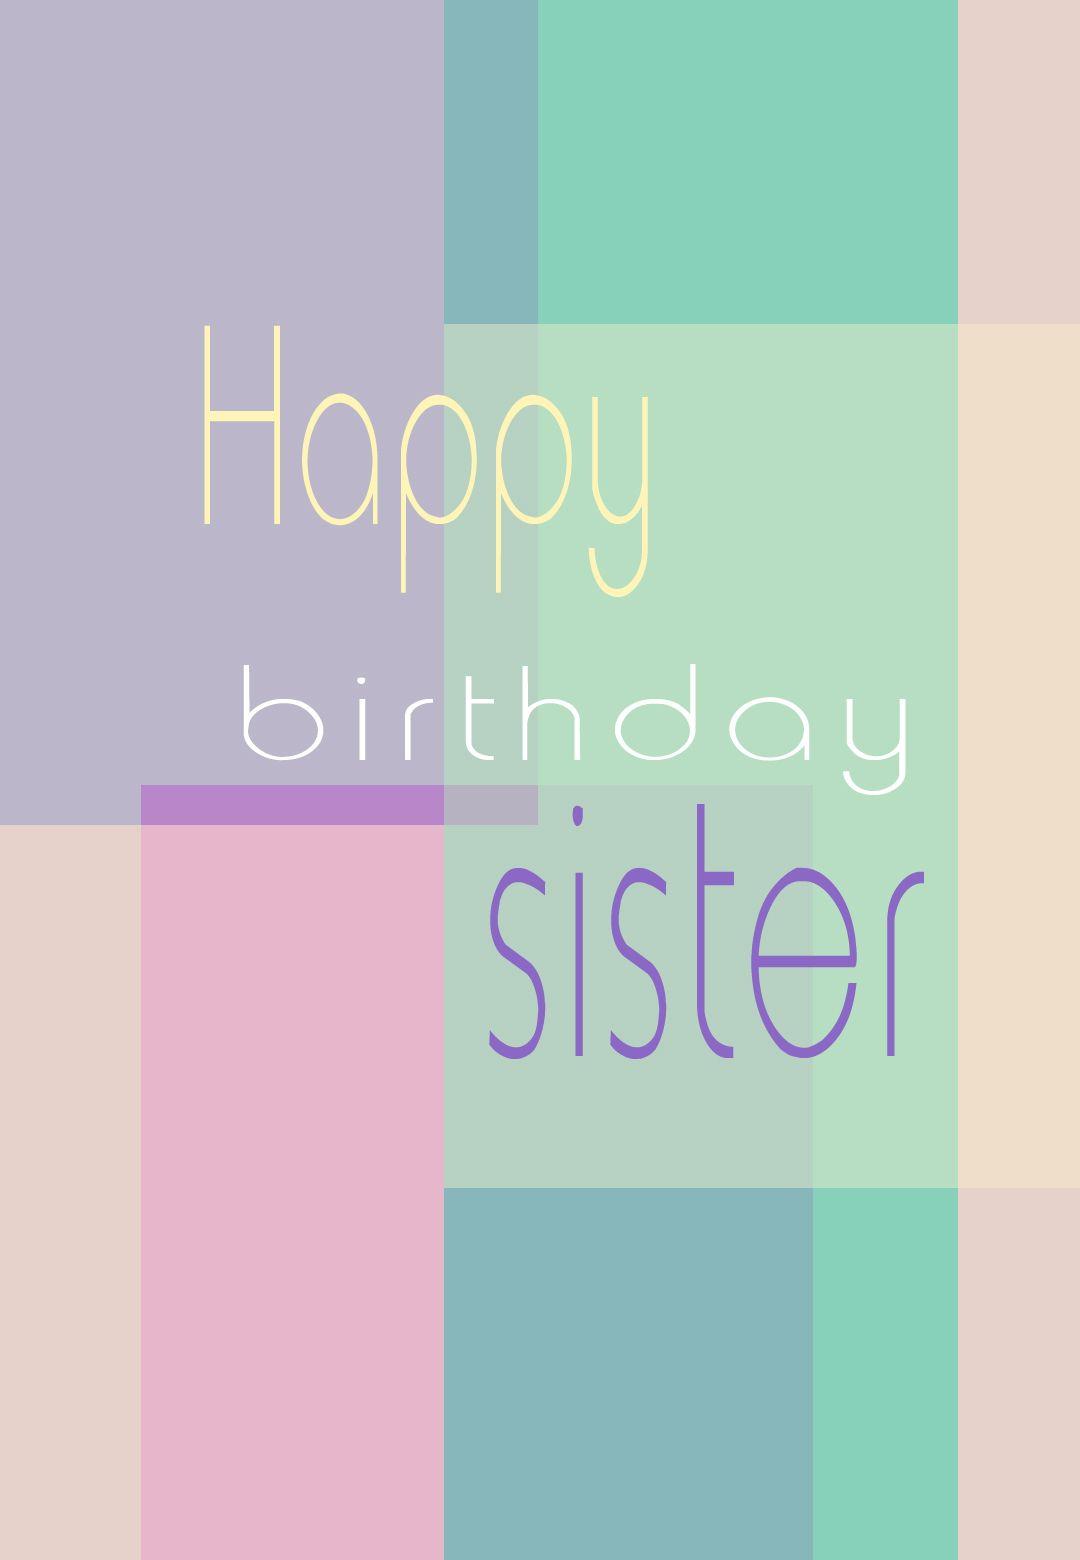 Happy Birthday To My Sisker Even If We Don T Speak I Wish U The Best